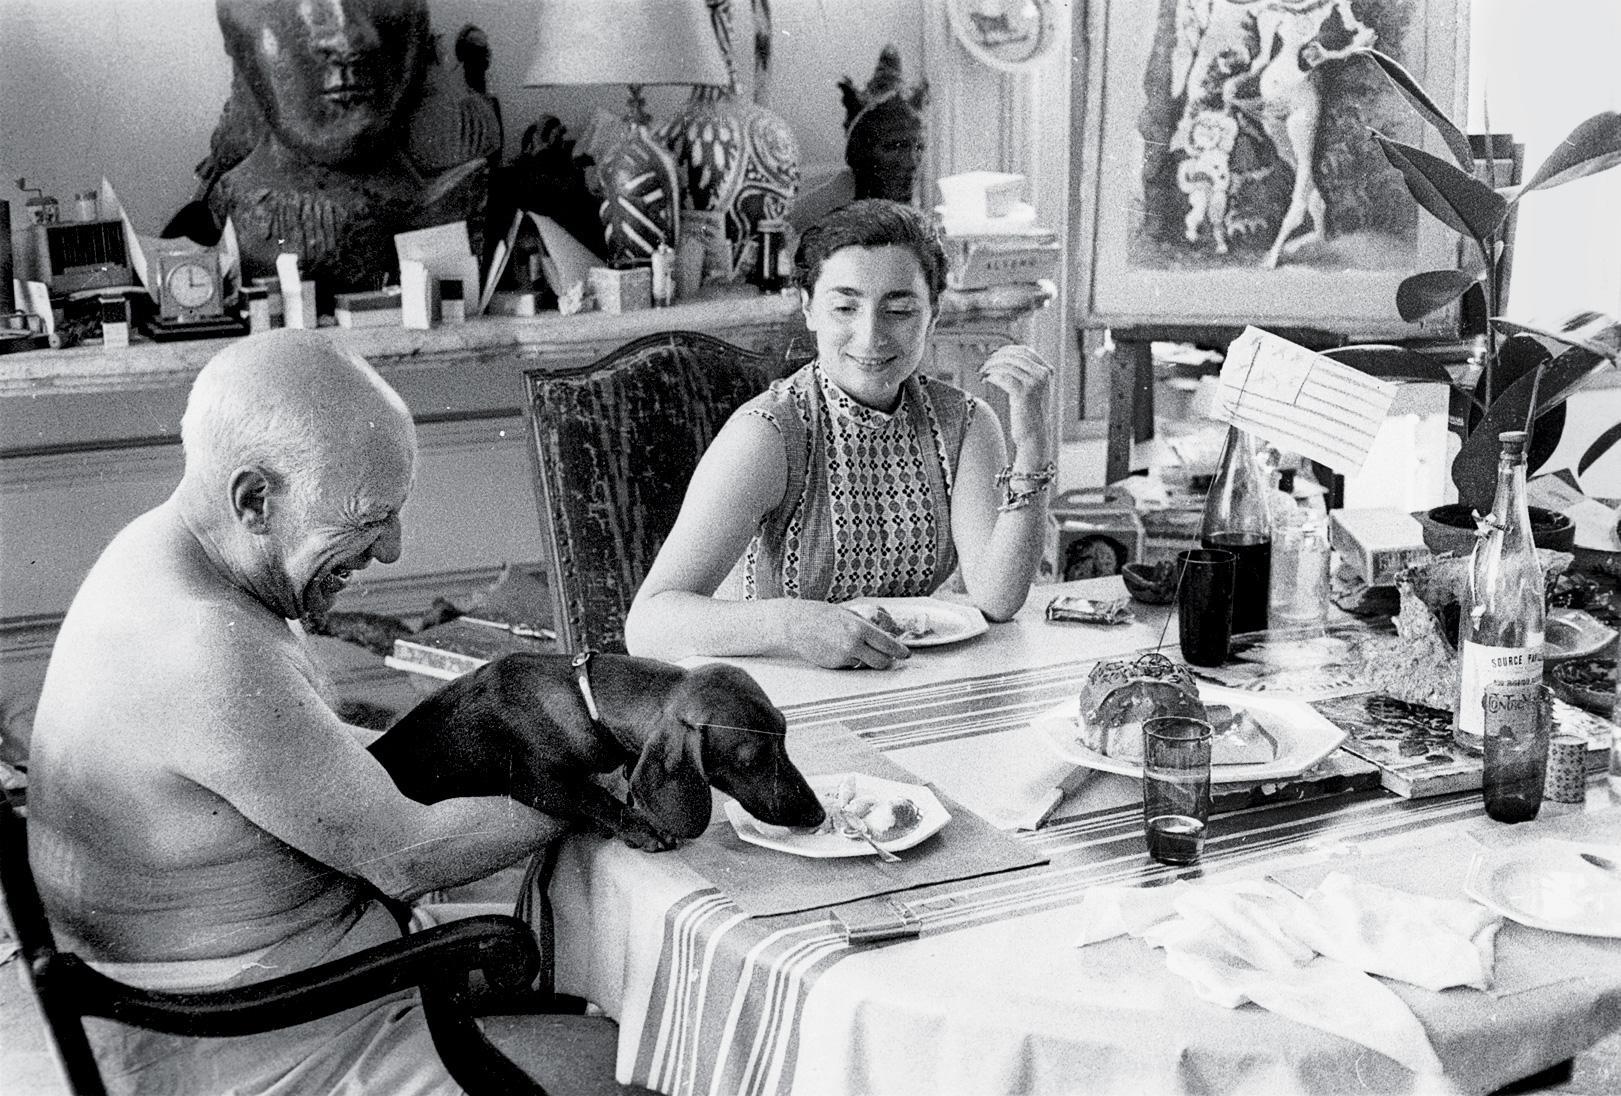 Picasso con Lump y Jacqueline Roque, foto: David Douglas Duncan.